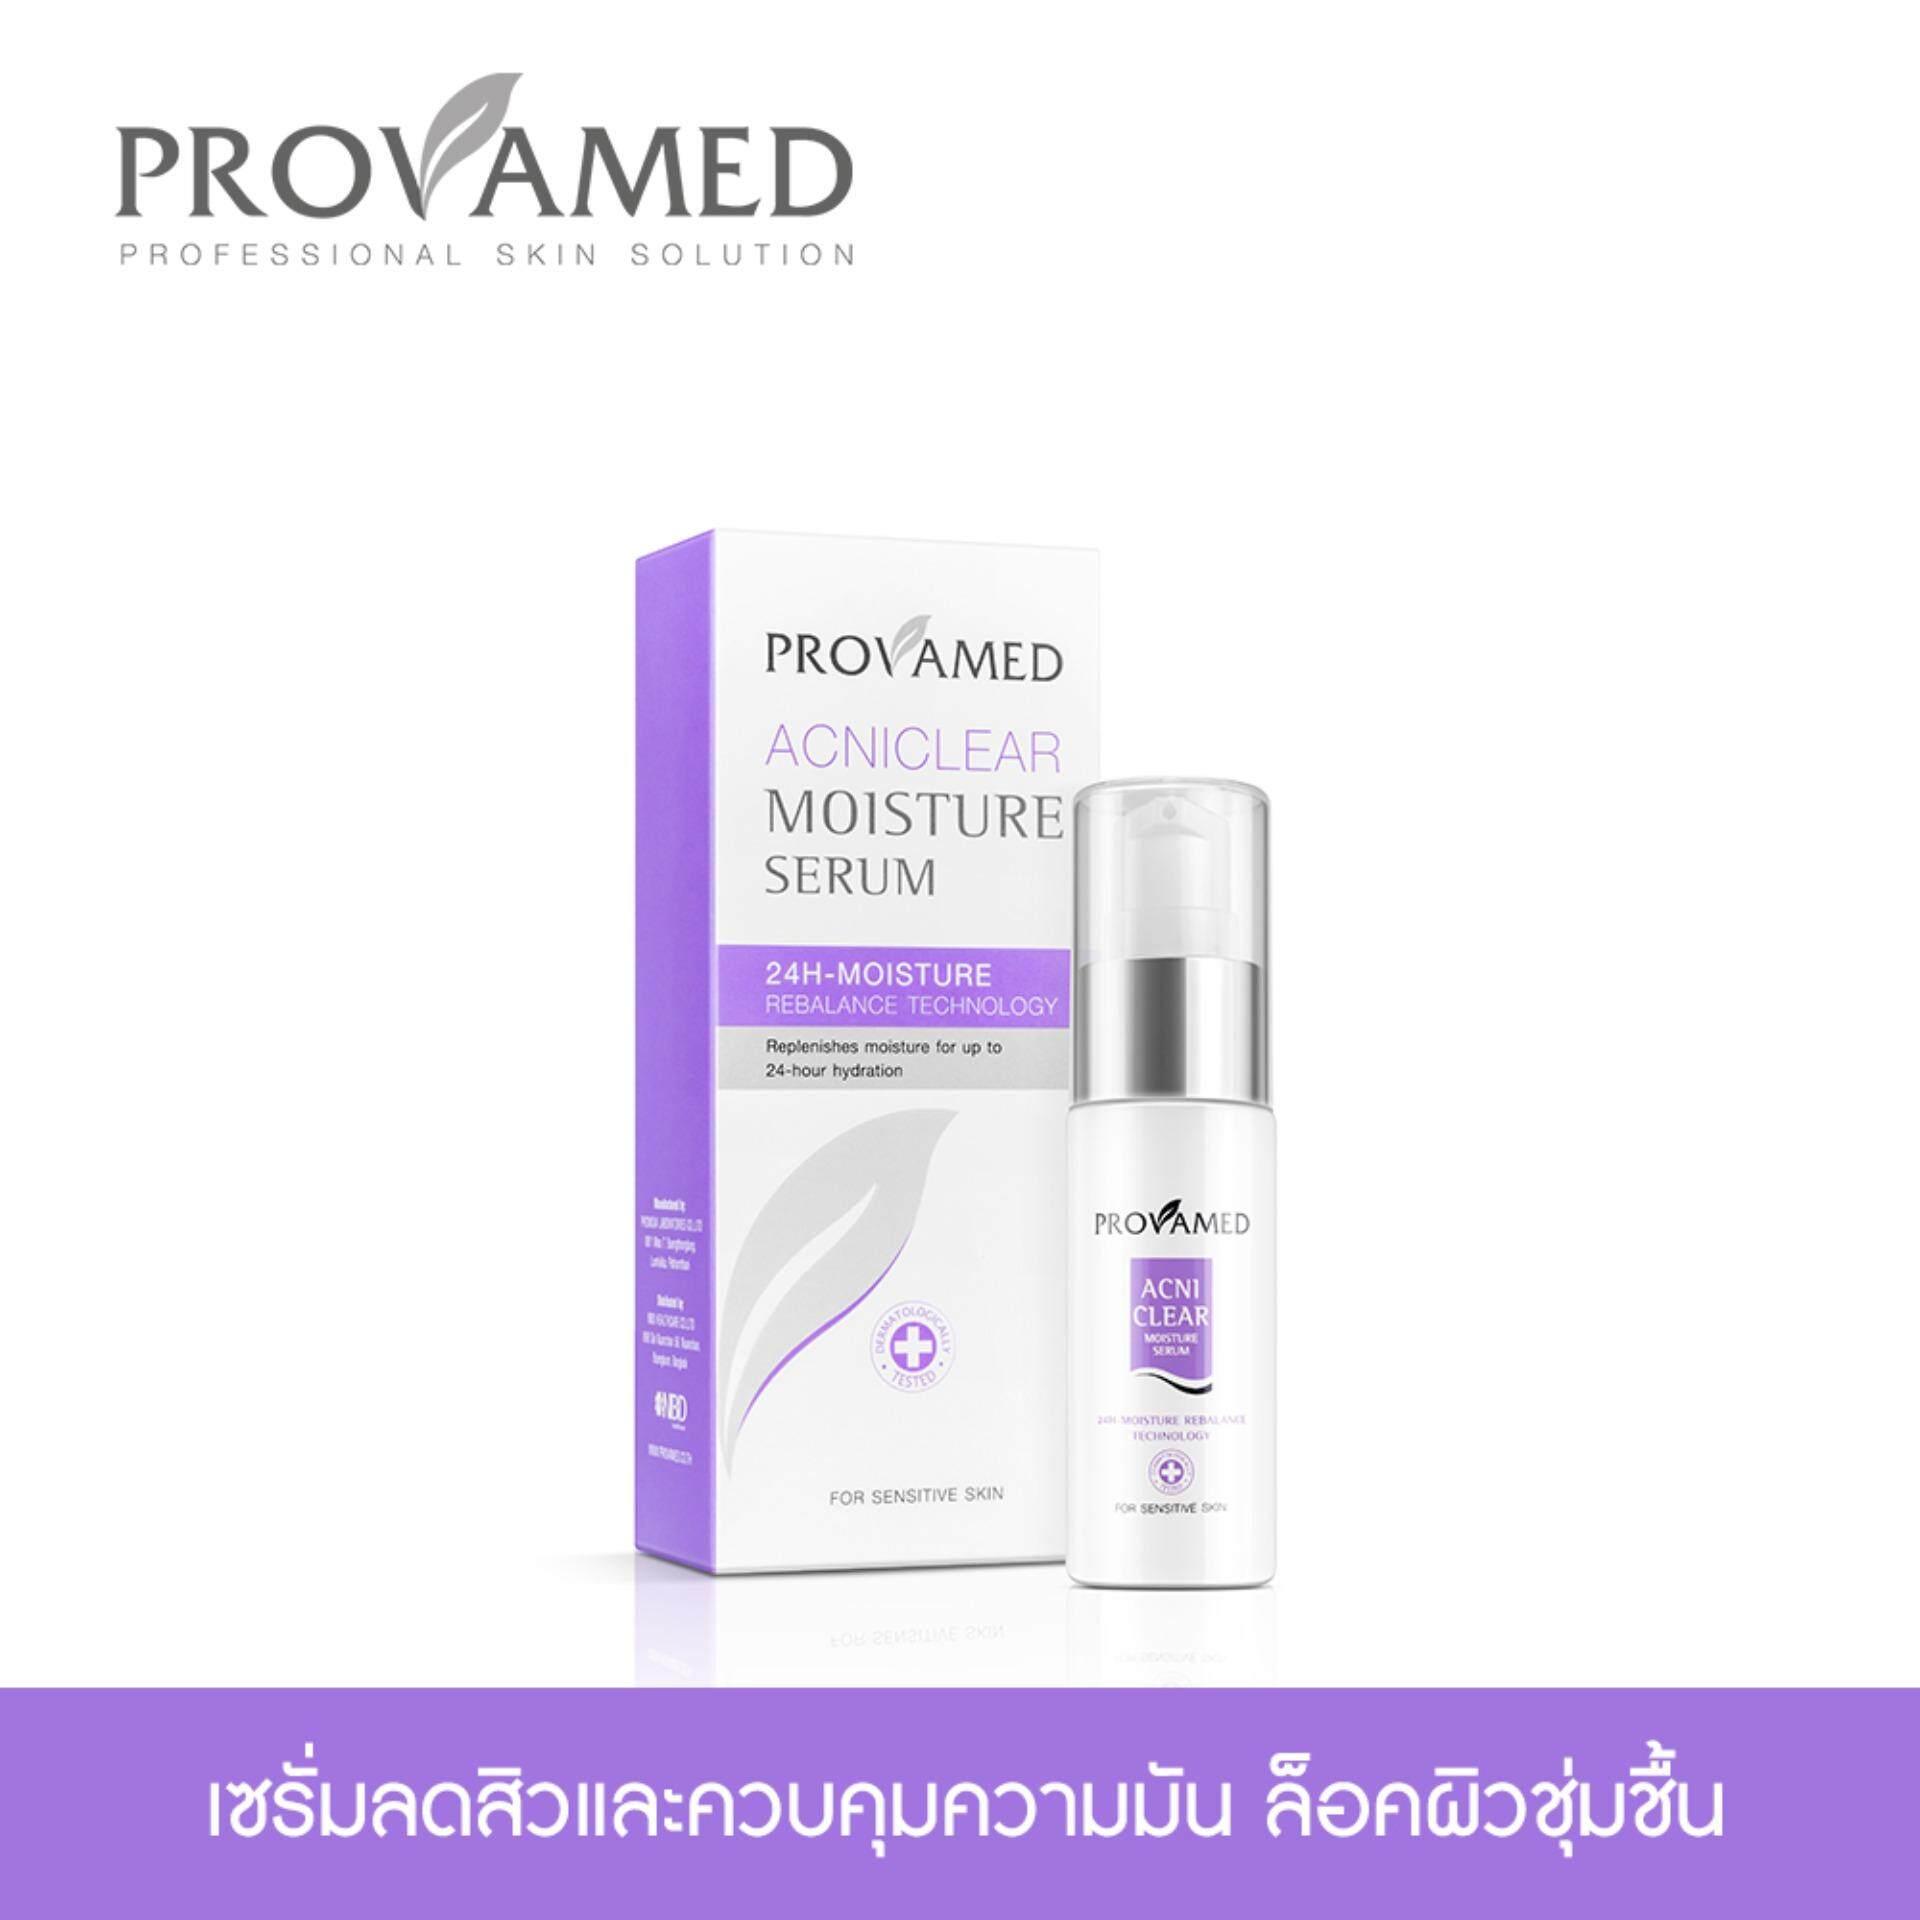 Provamed Acniclear Moisture Serum 30 g.